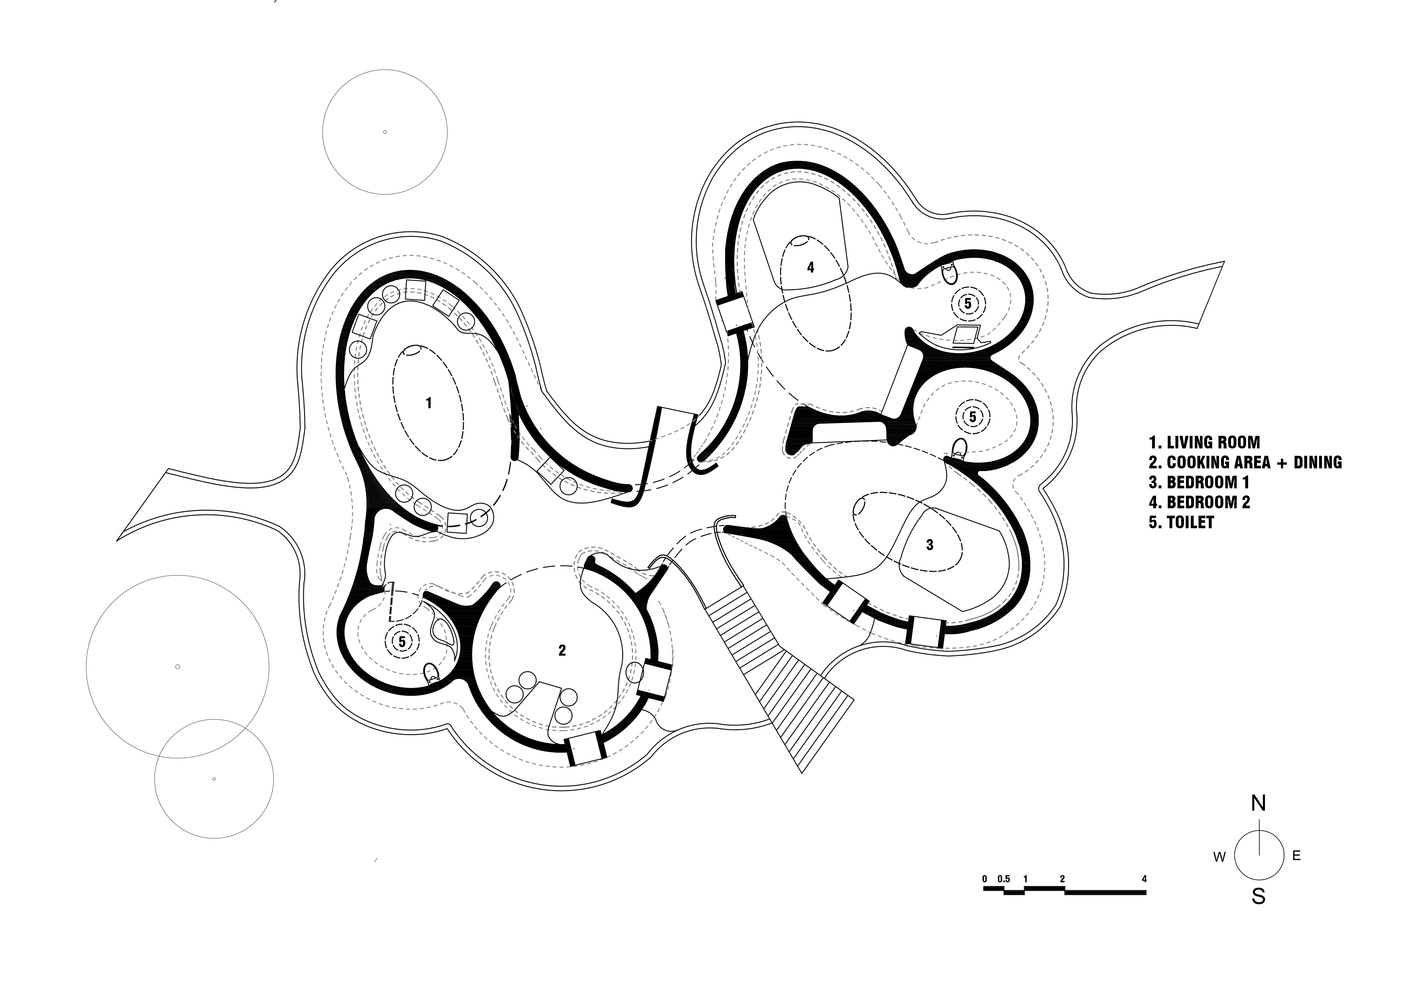 3_plan.jpg